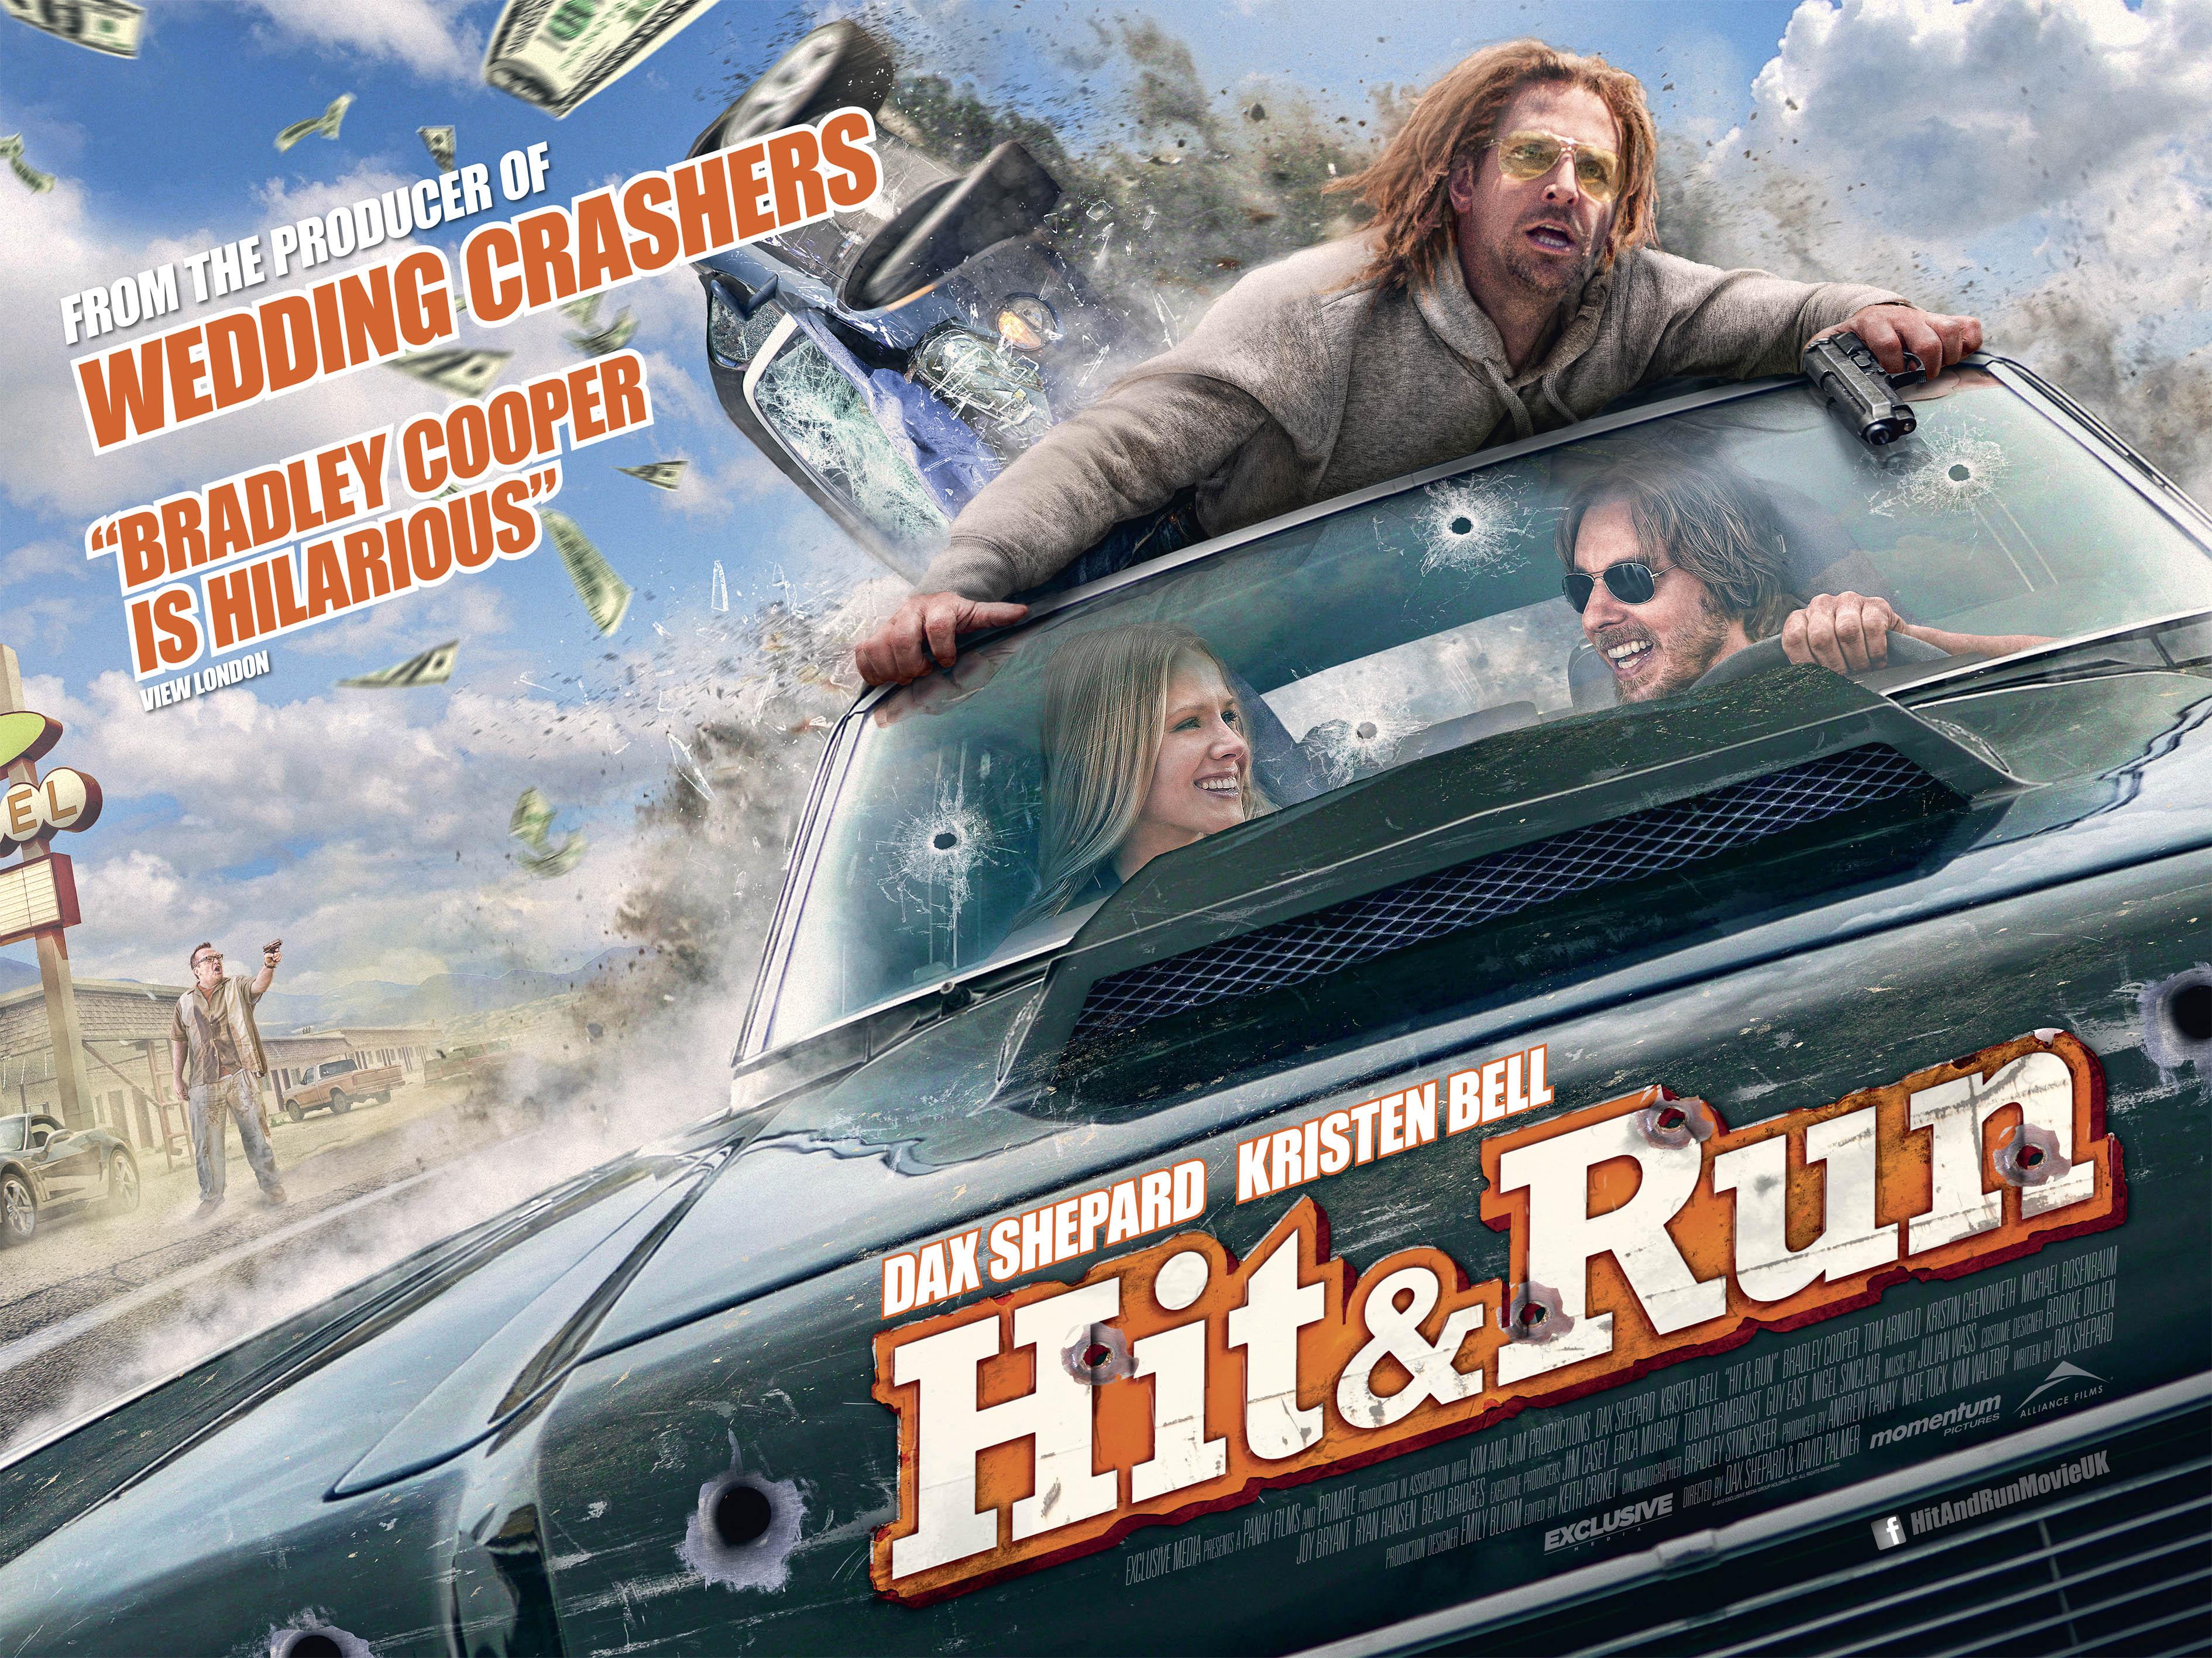 Hit and Run UK Poster